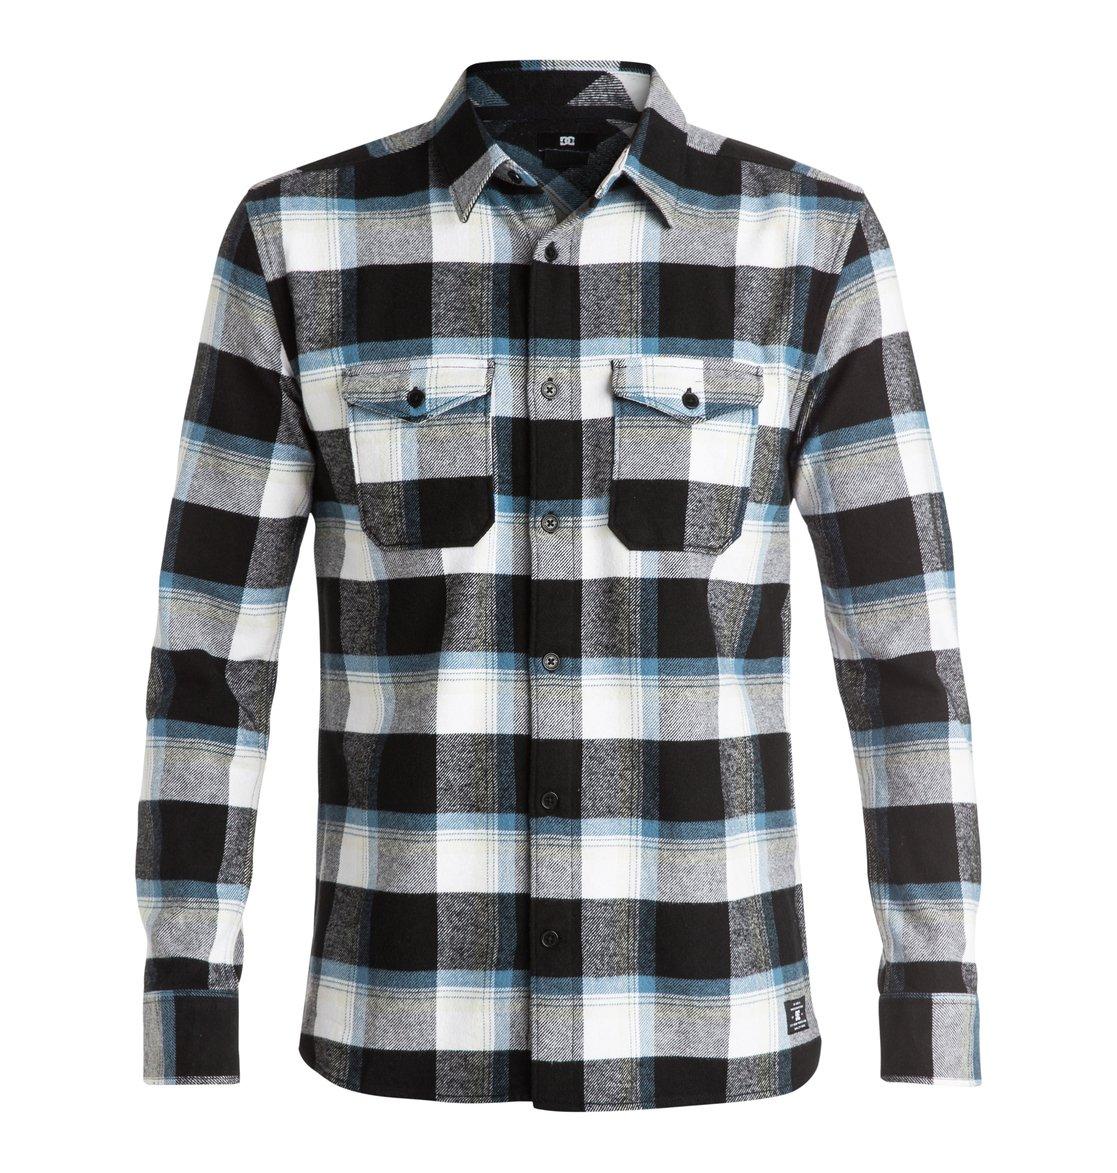 Рубашка Marsha Flannel с длинным рукавом рубашка в клетку dc shoes marsha marsha blue iris